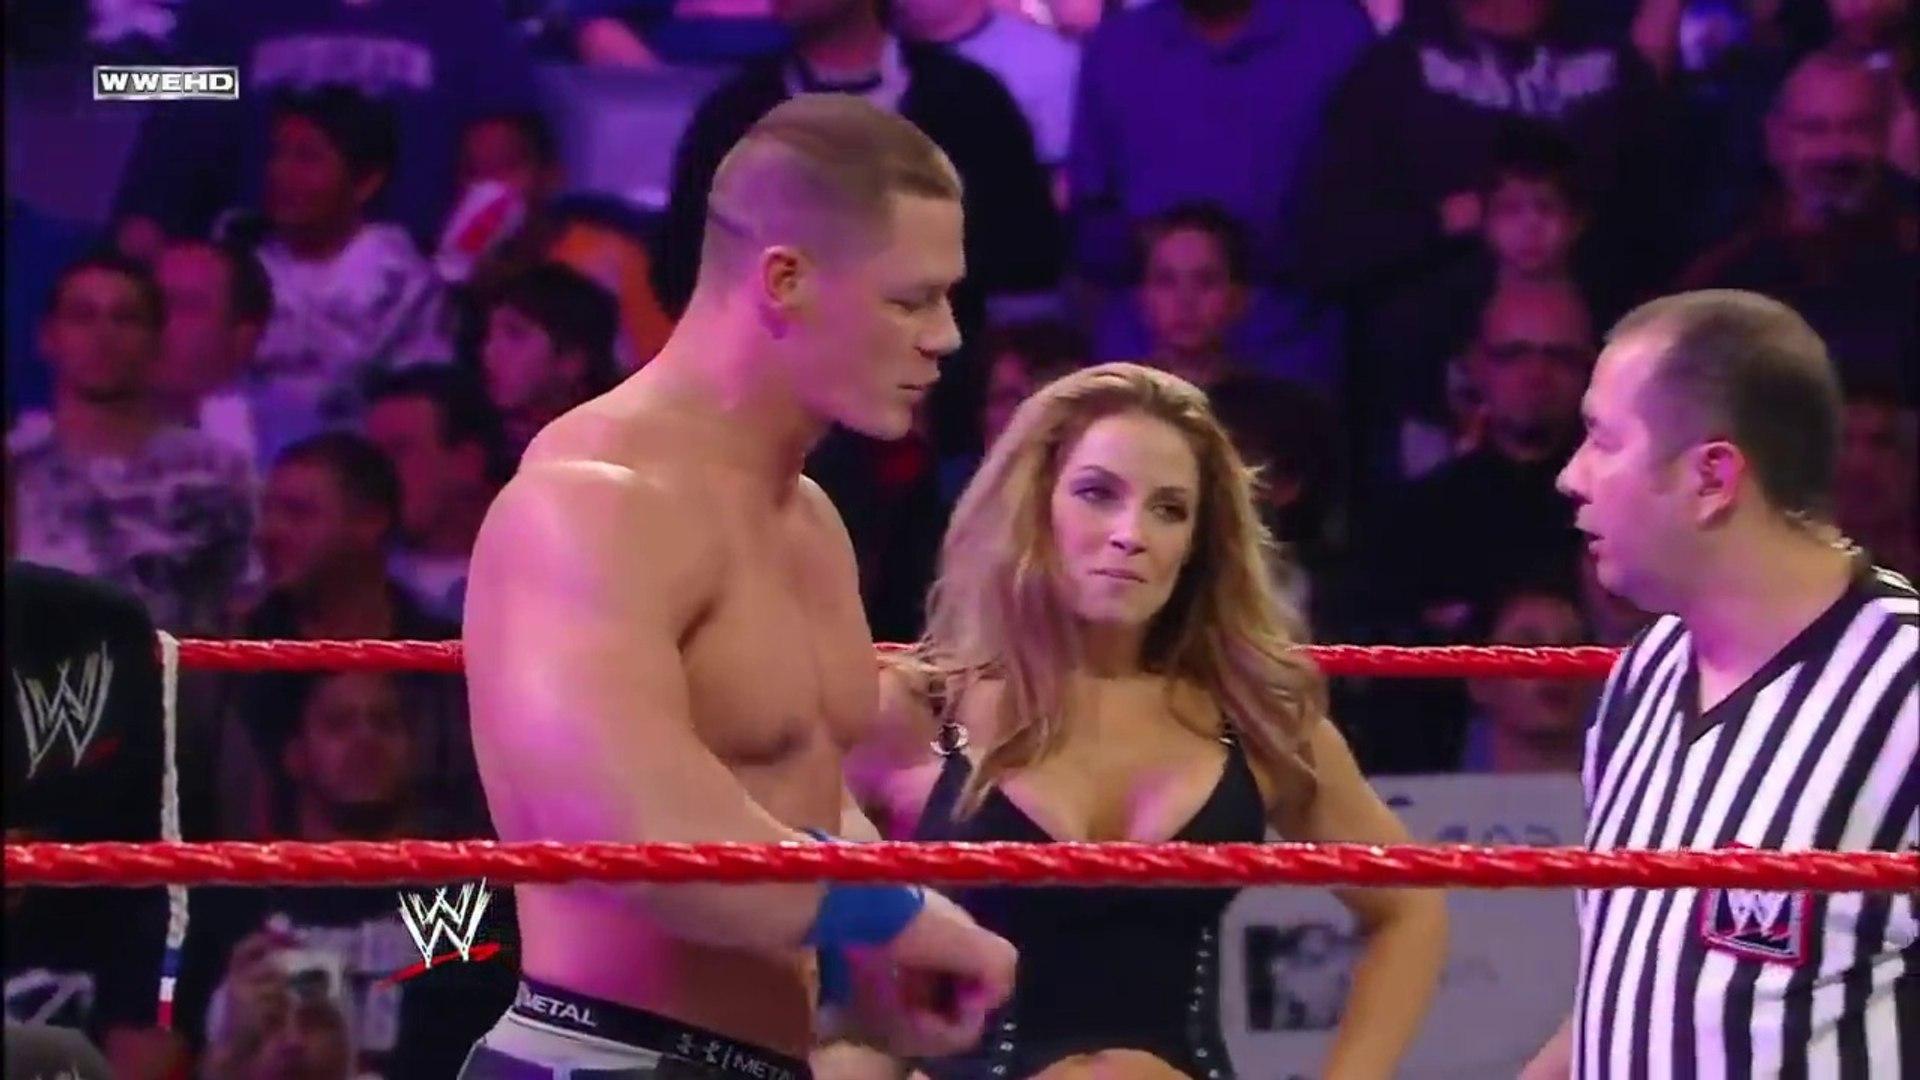 WWE John Cena and Trish Stratus vs Santino and Beth Phoenix | December 22, 2008 by wwe entertainment